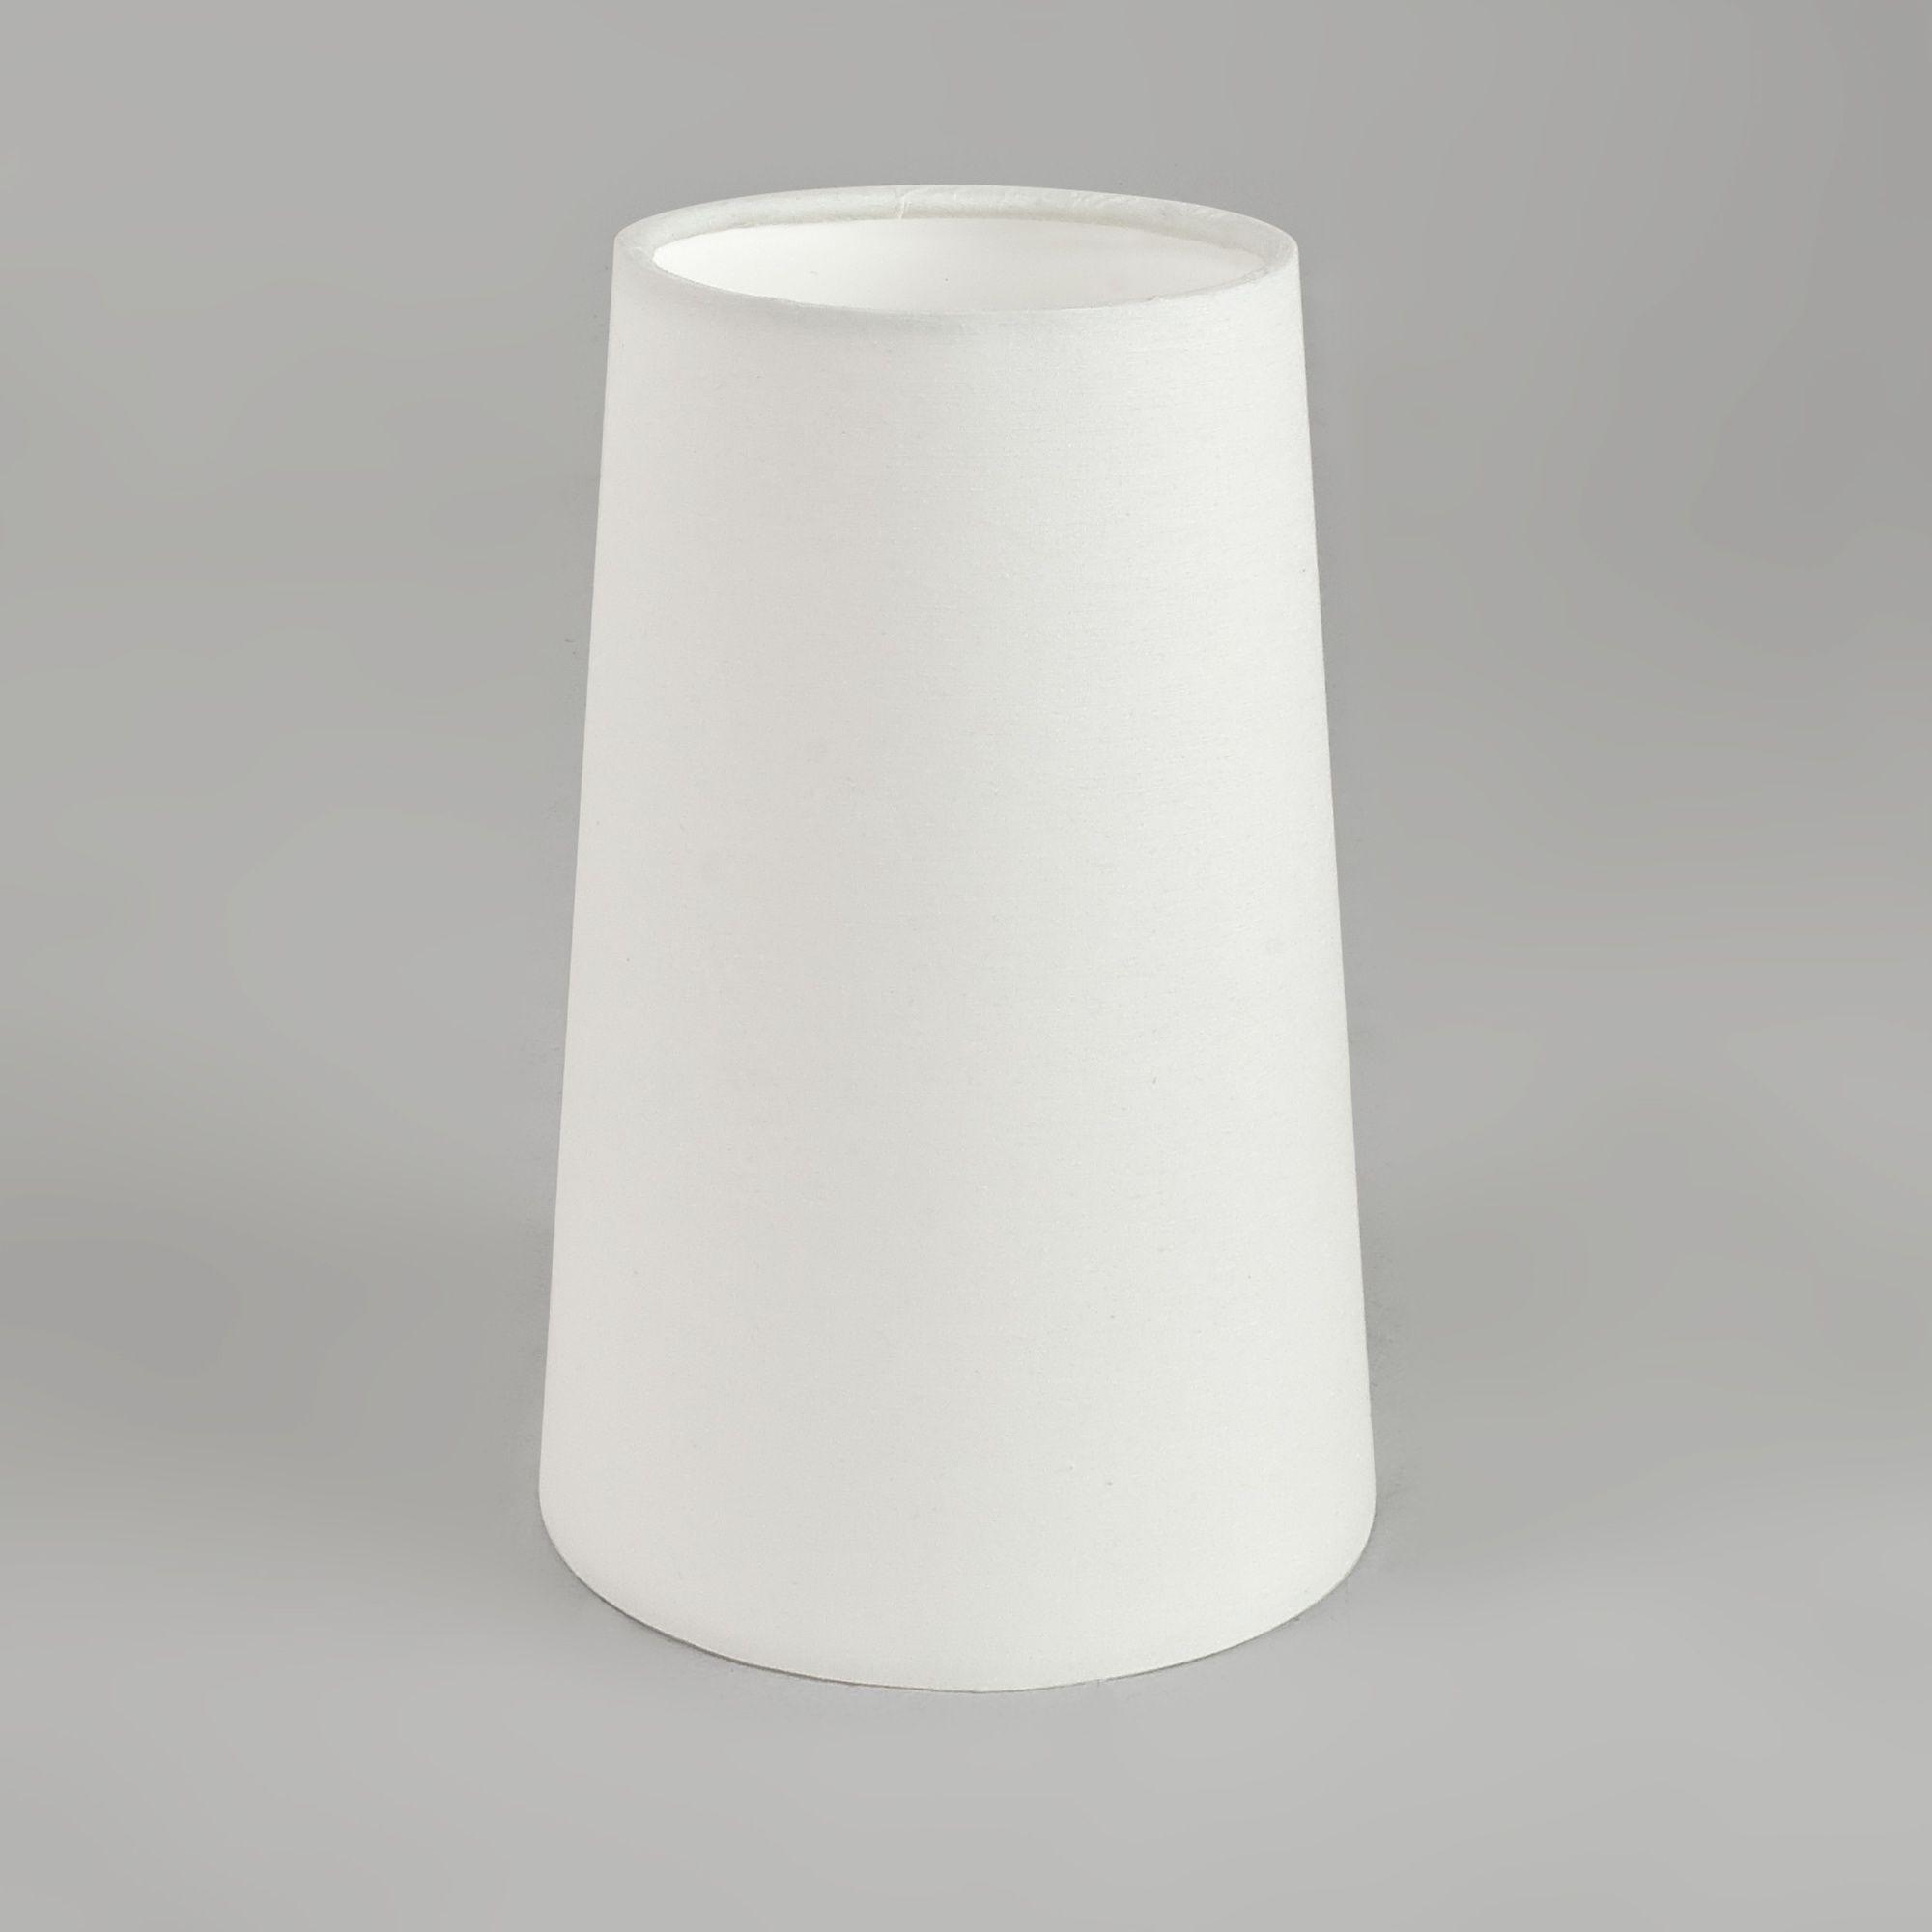 Abażur Cone 4080 Biały Astro Lighting